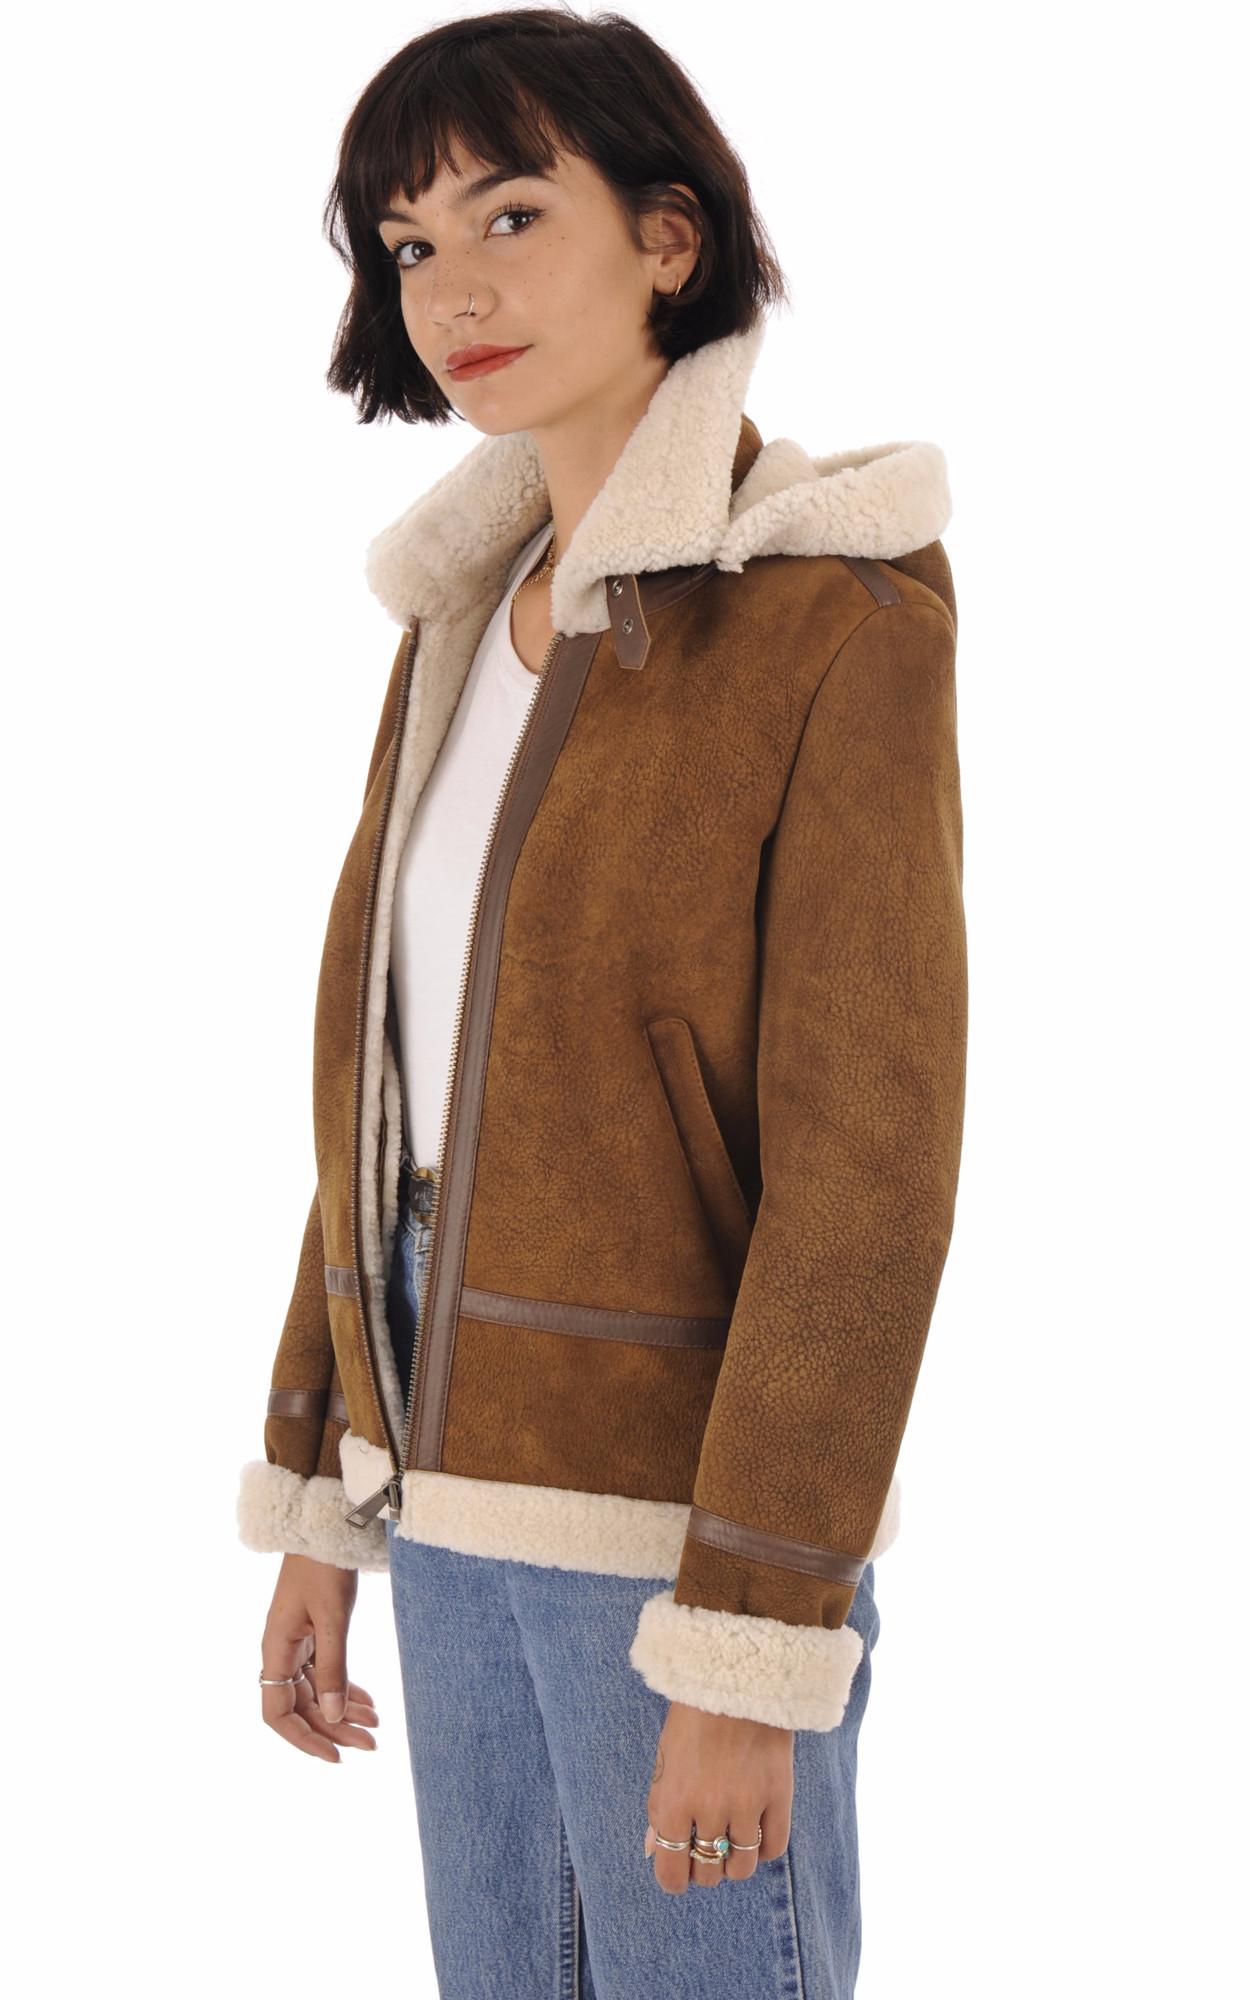 Belle brune femme veste en cuir rouge avec penser Banque D